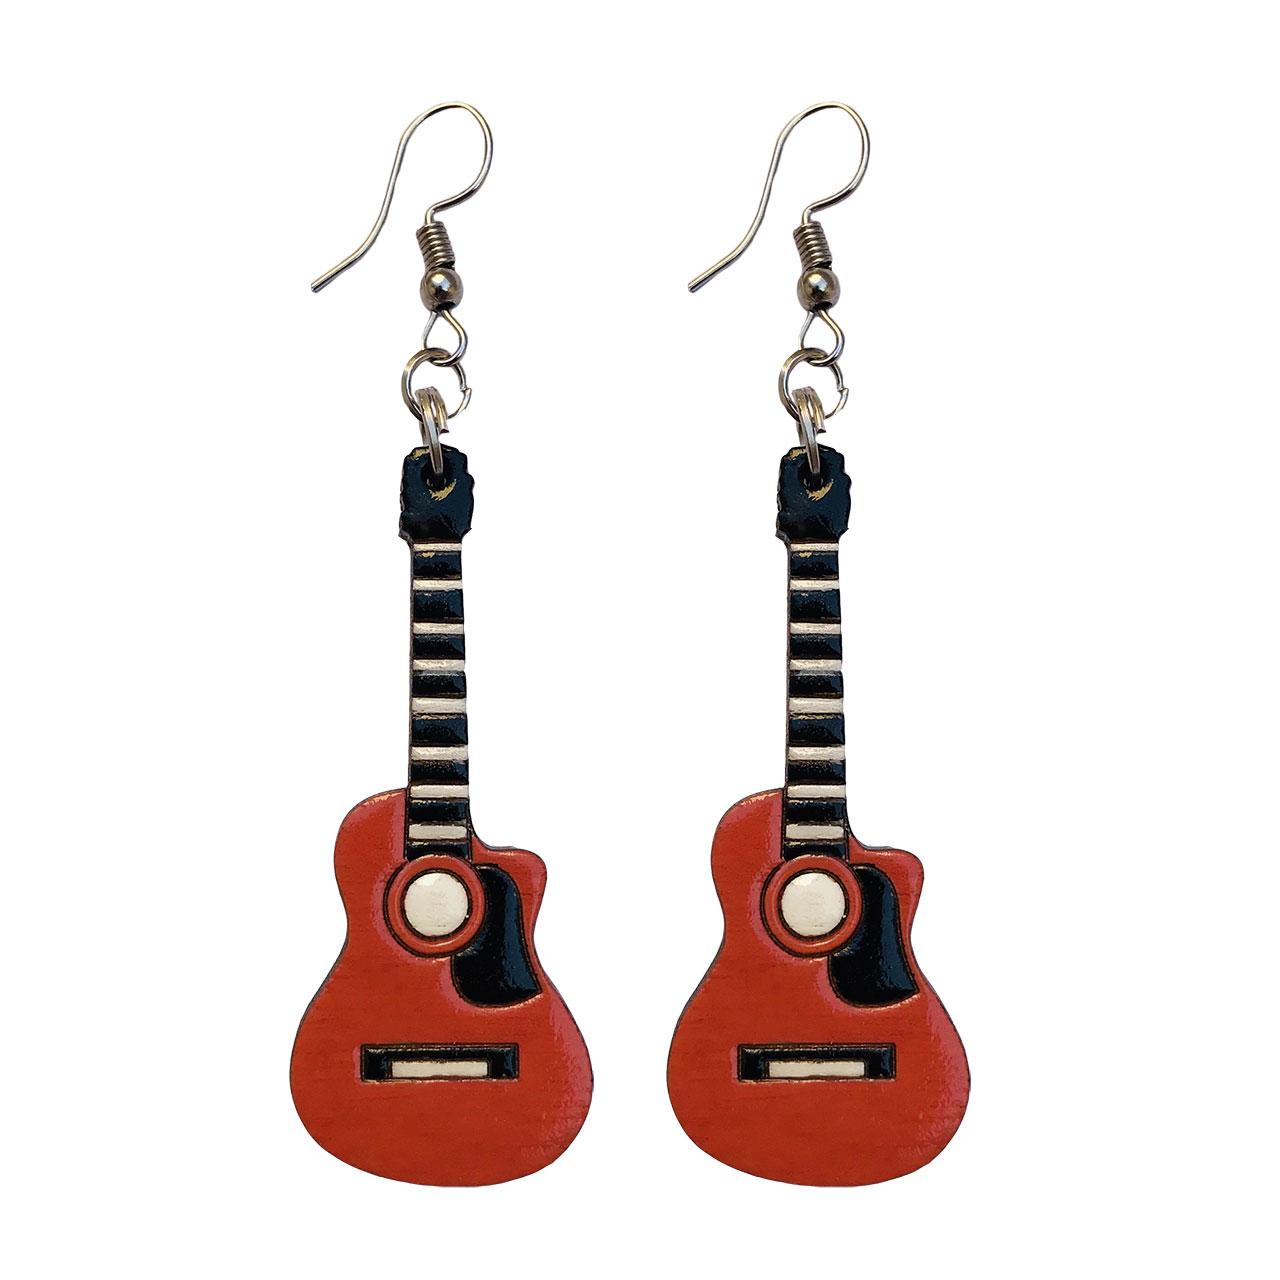 گوشواره زنانه طرح گیتار کلاسیک کد 012